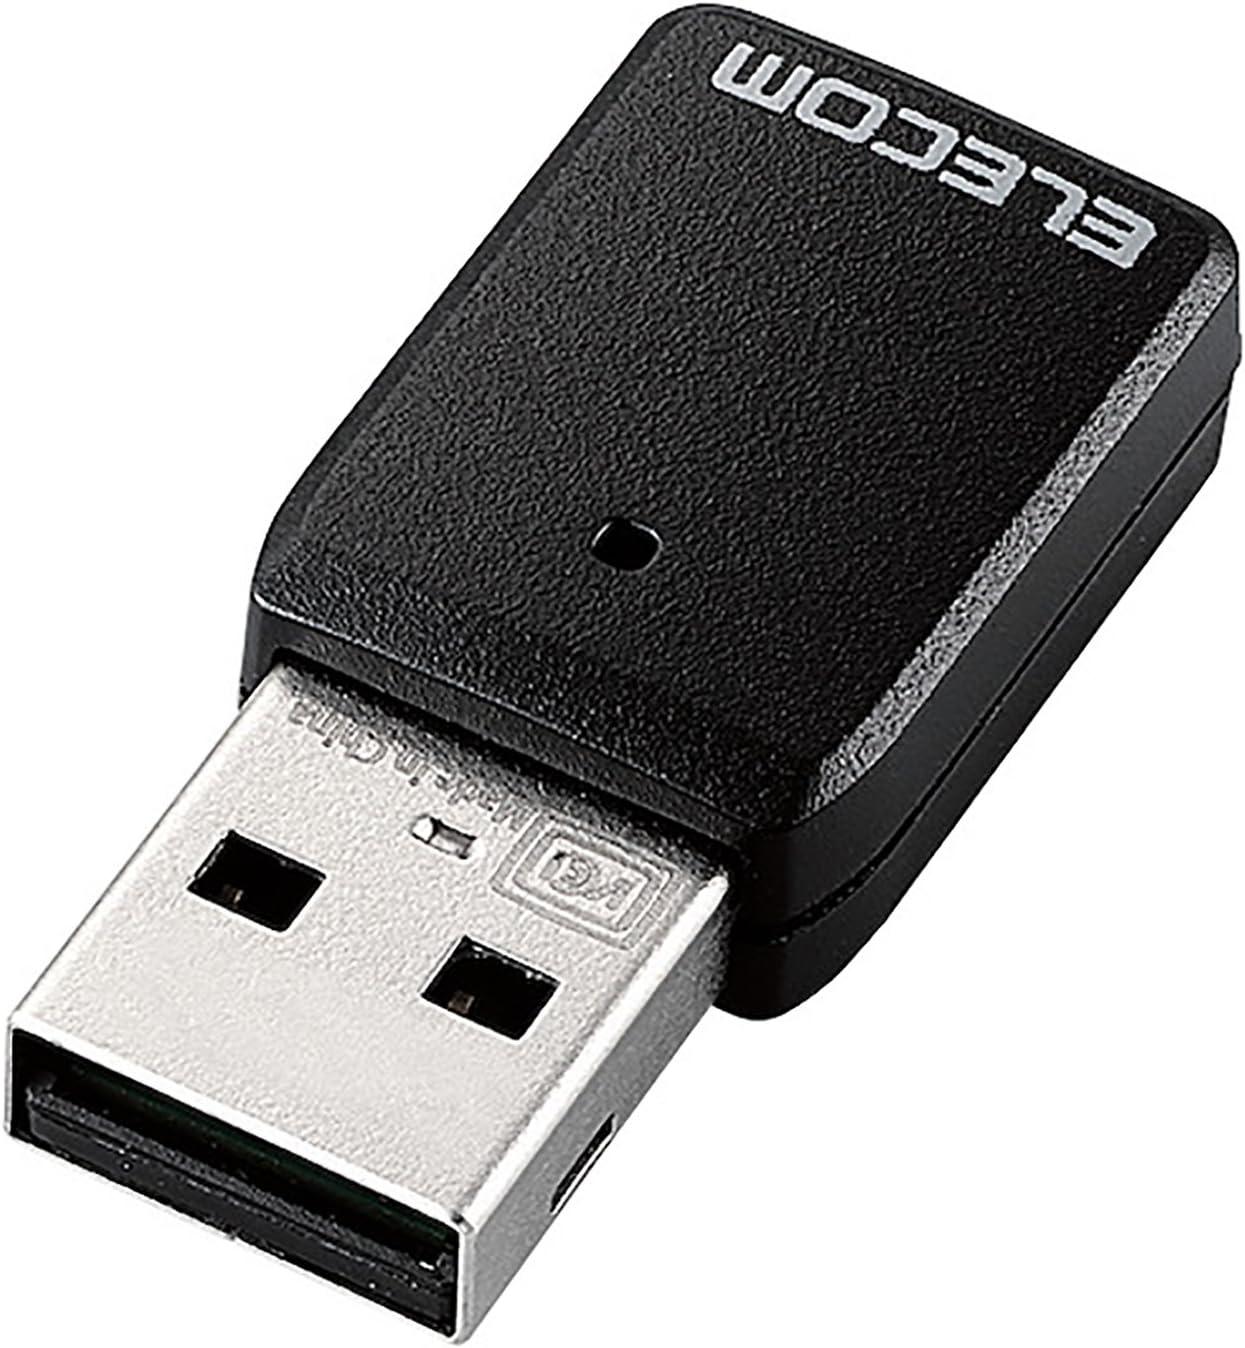 エレコム Wi-Fi 無線LAN 子機 11ac/n/g/b/a 867Mbps 5GHz/2.4GHz対応 USB3.0 MU-MIMO windows/mac対応 ブラック WDC-867DU3S